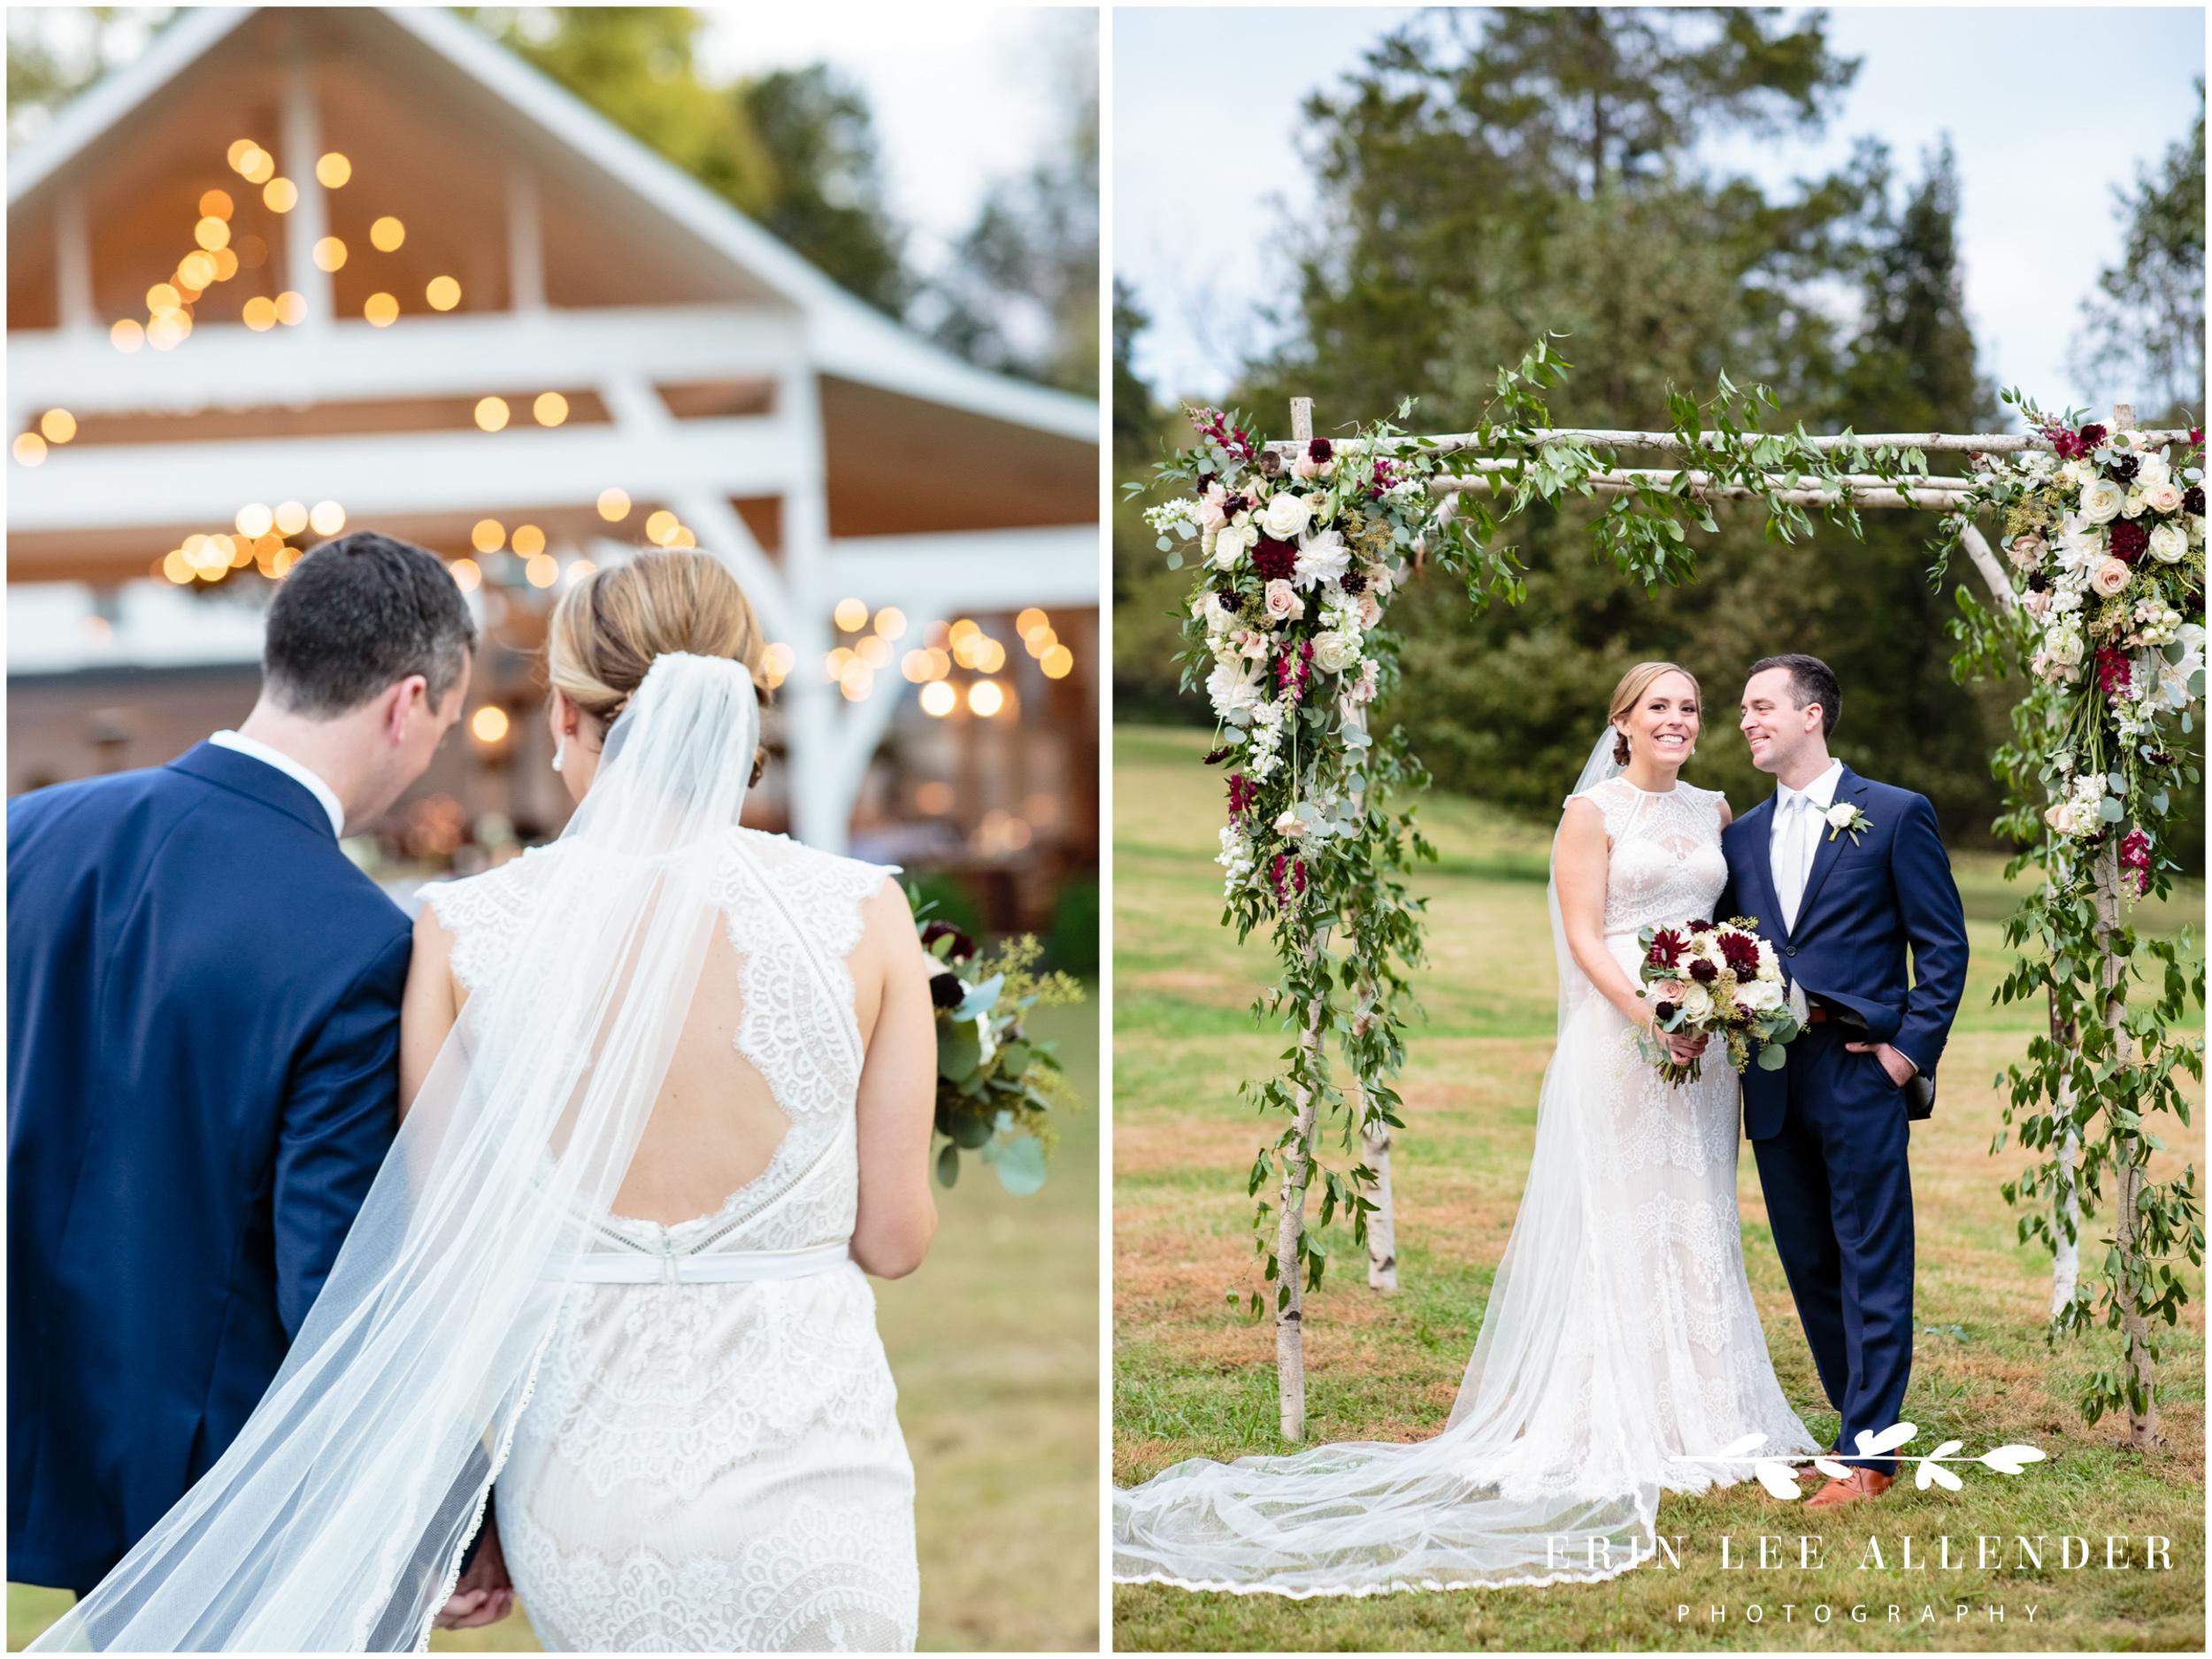 Bride-Groom-Under-birch-canopy